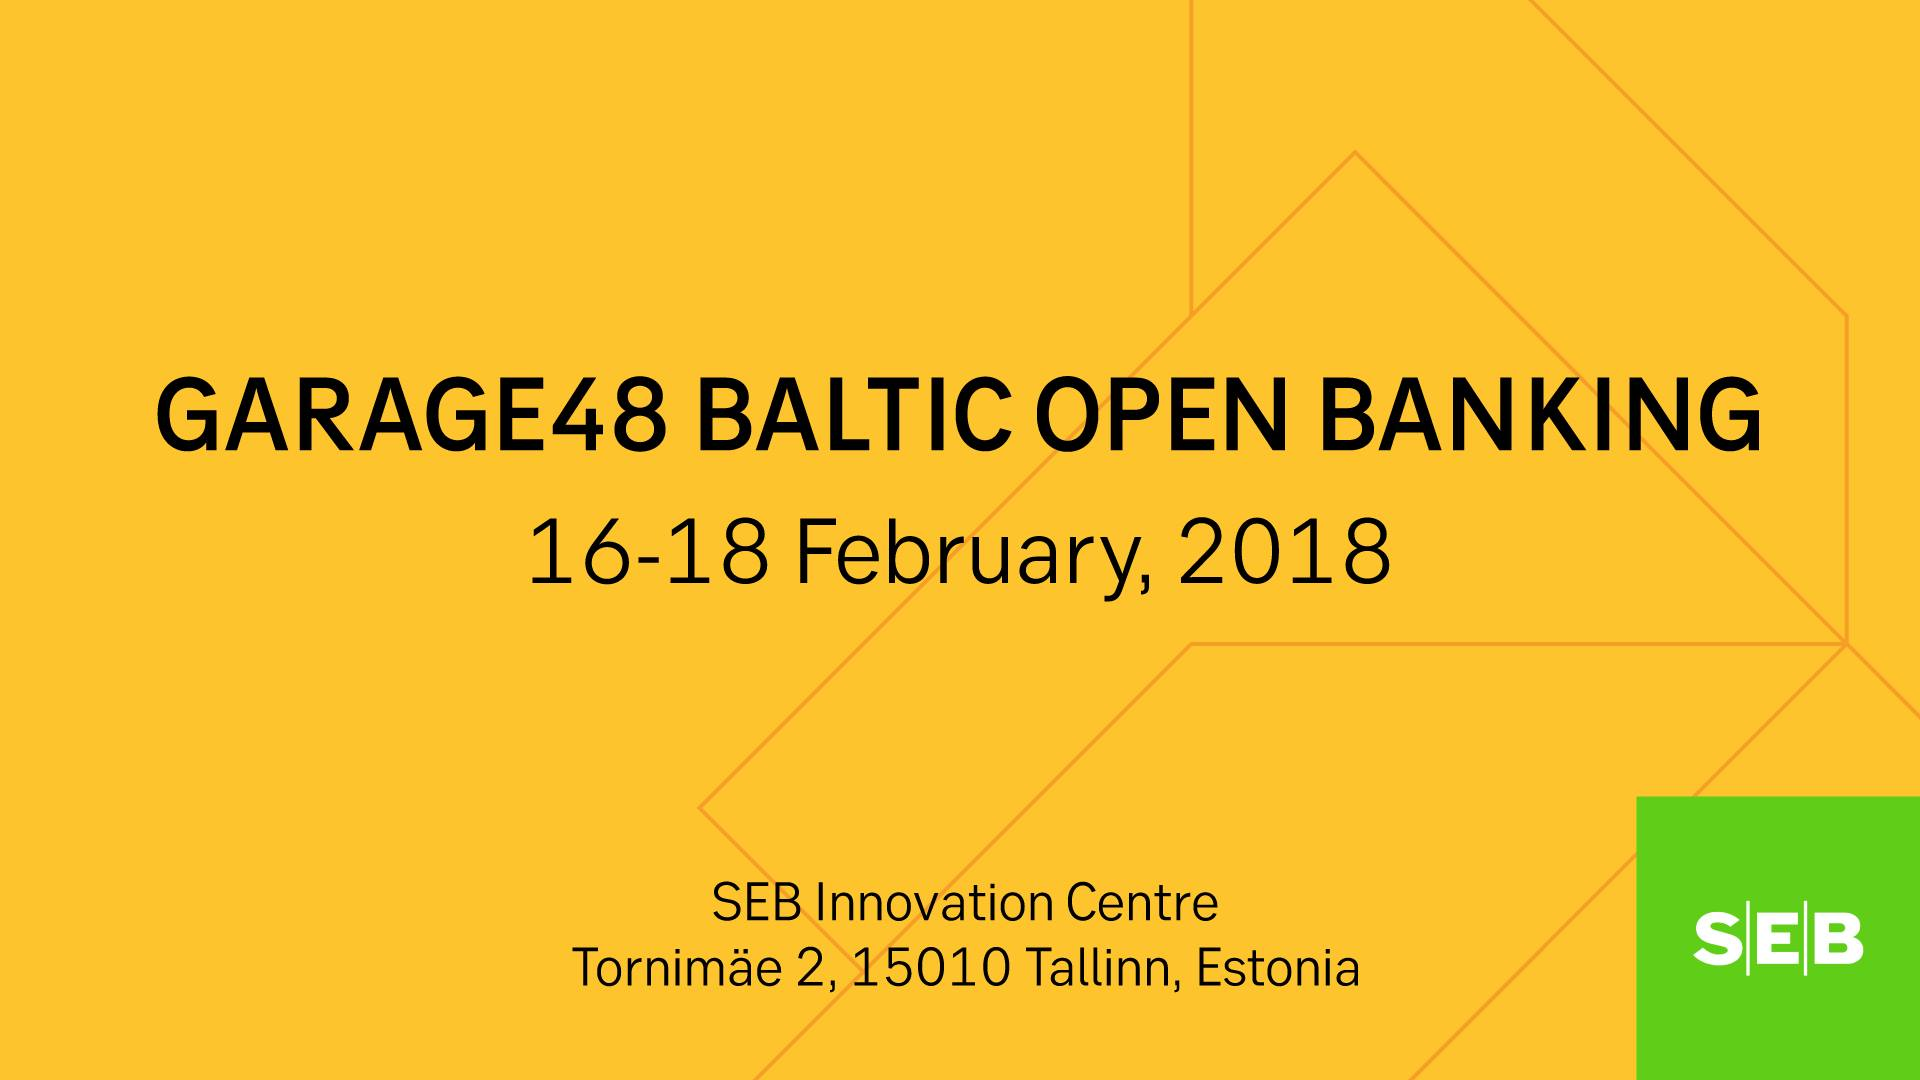 seb_open_banking_hackathon.jpg